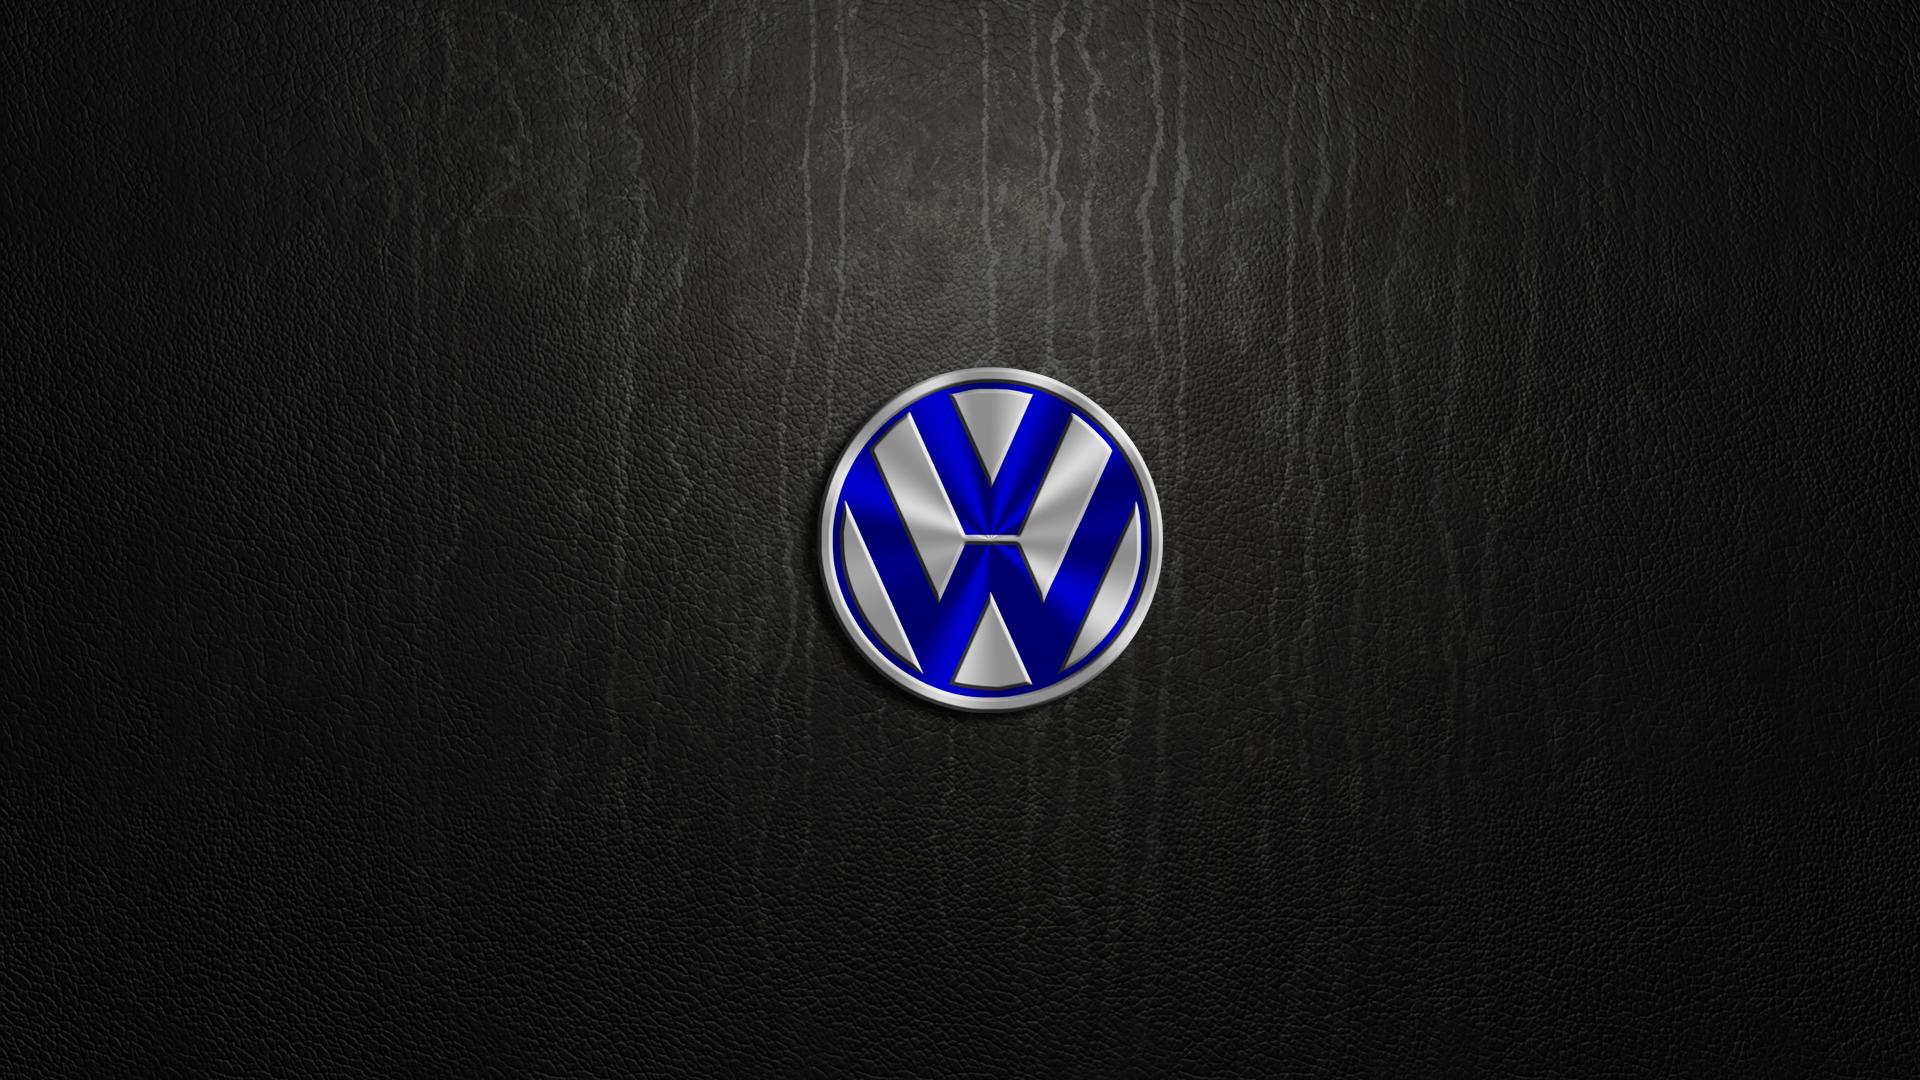 Volkswagen Logo 23443 1920x1080 Px Hdwallsource Com